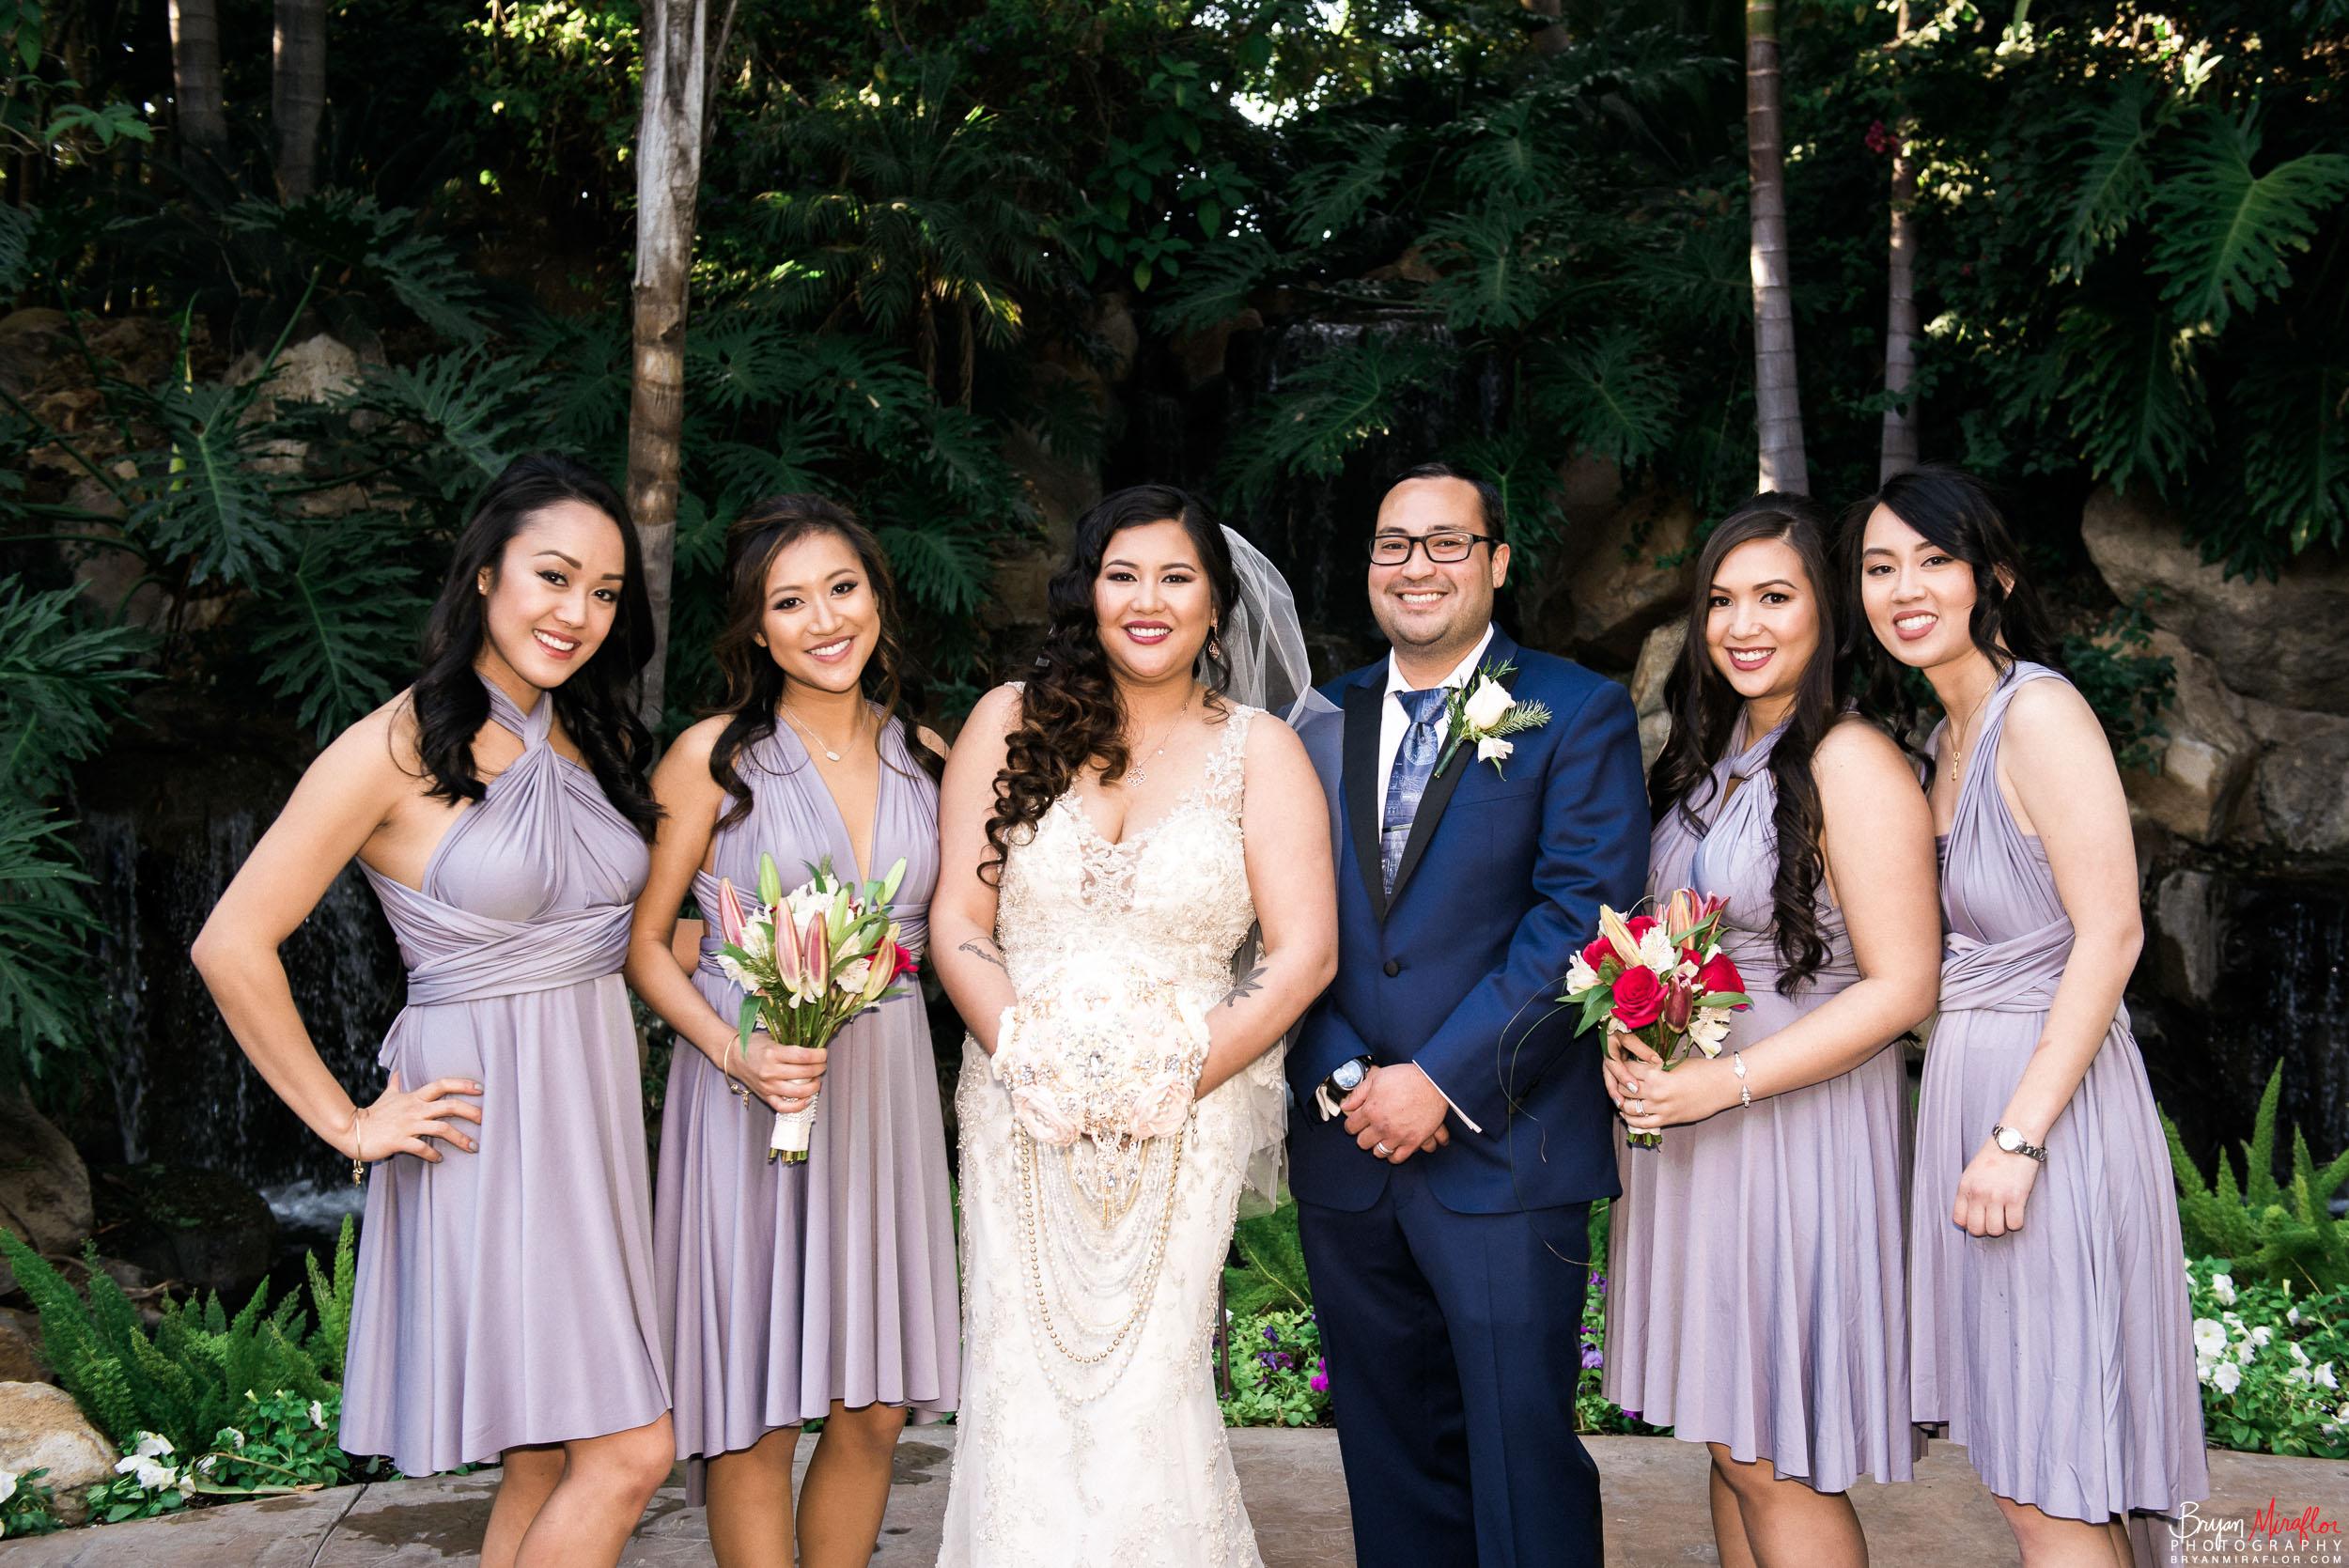 Bryan-Miraflor-Photography-Hannah-Jonathan-Married-Grand-Traditions-Estate-Gardens-Fallbrook-20171222-137.jpg